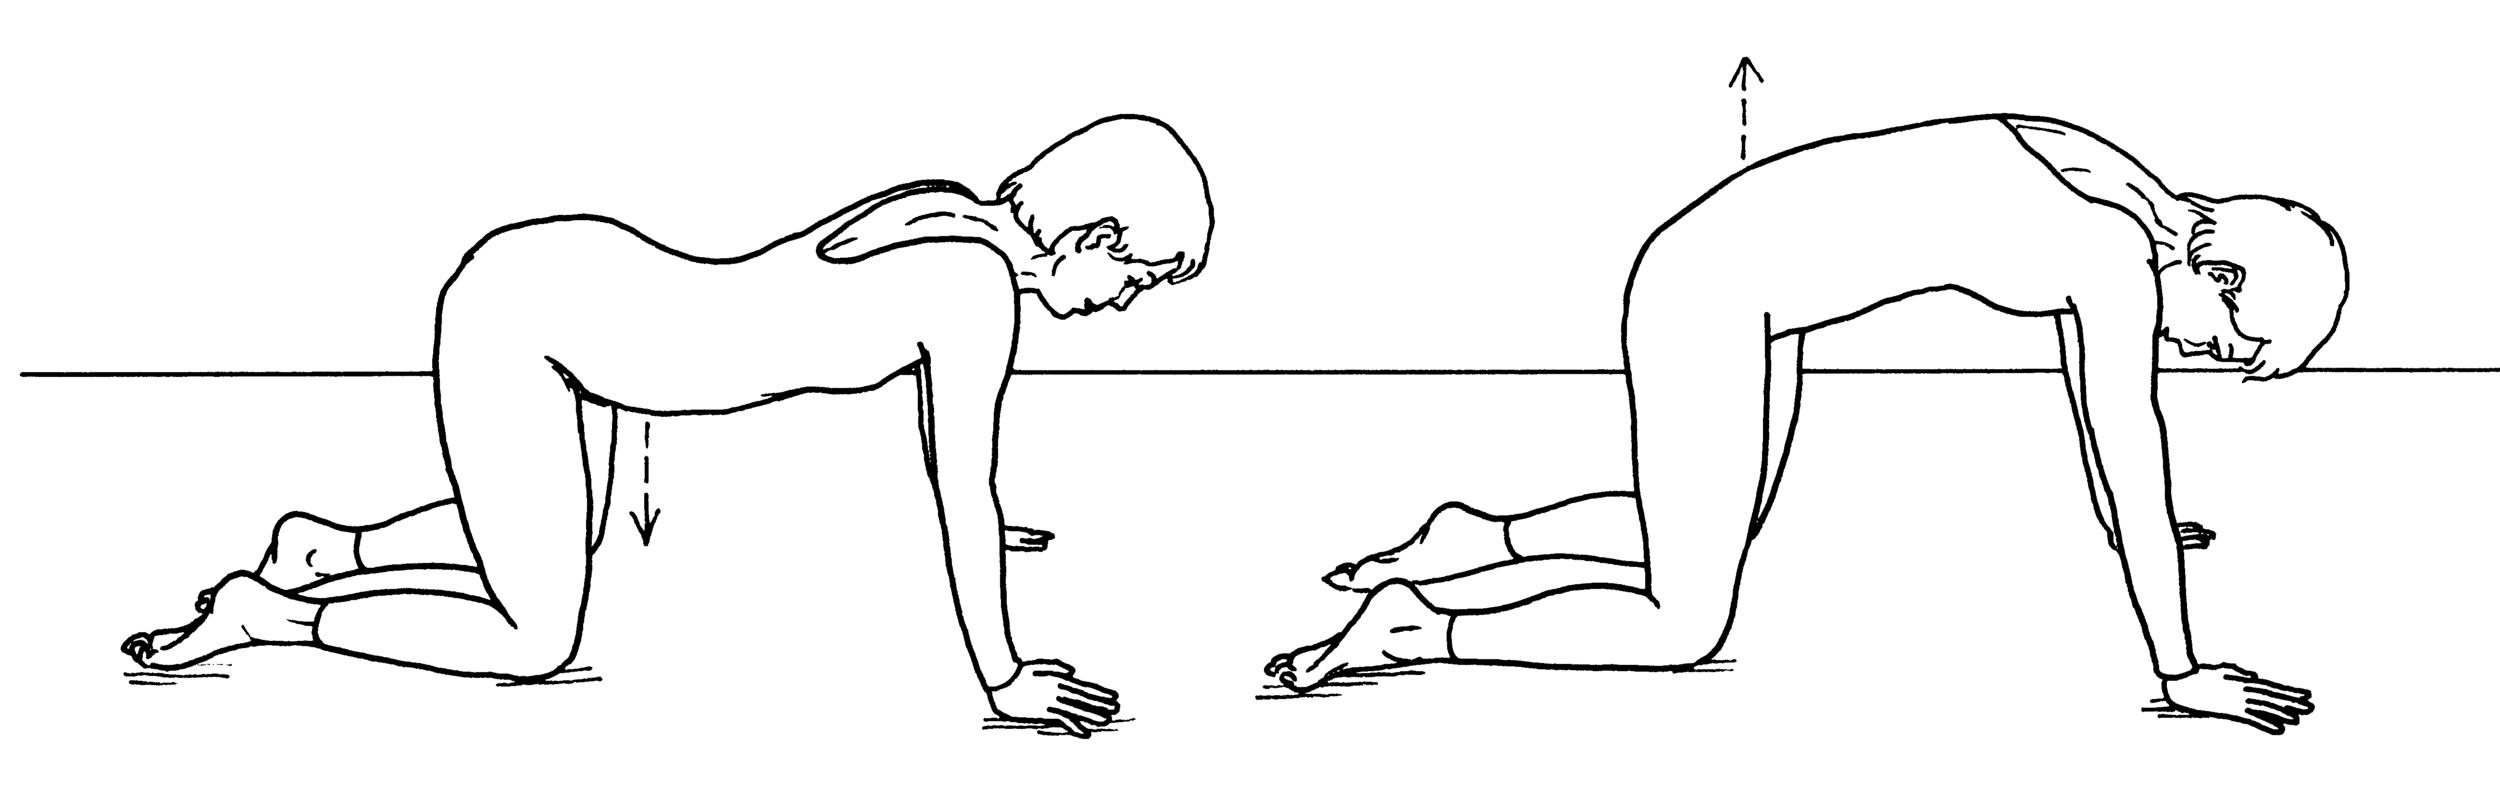 9.cat stretch var. lower back.jpg